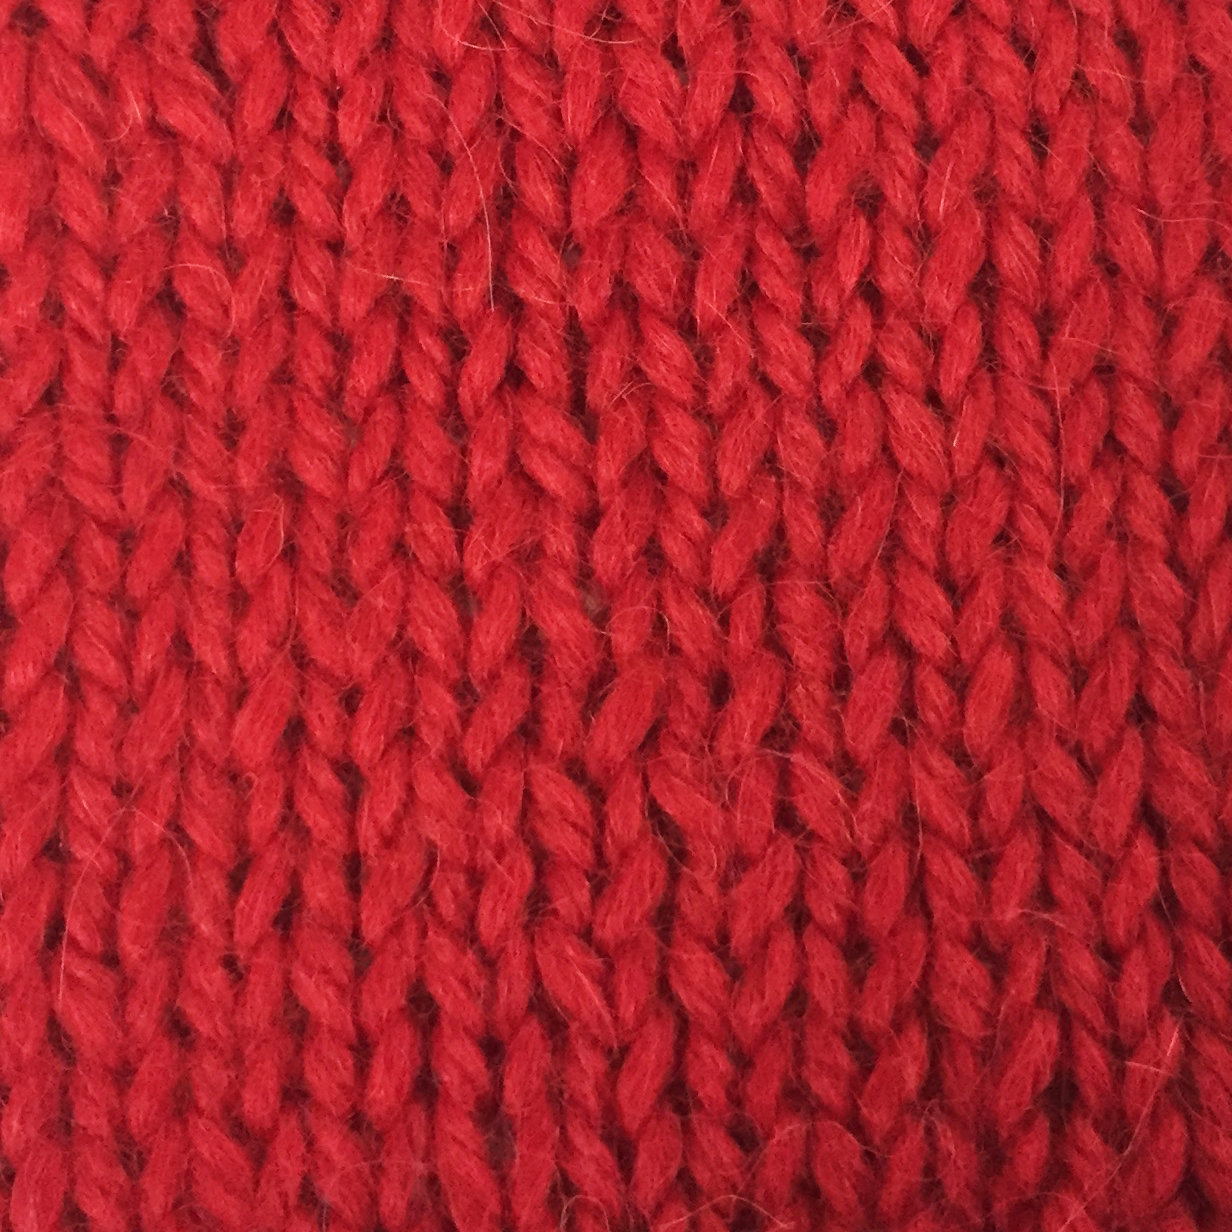 Snuggle Yarn - Jubilee